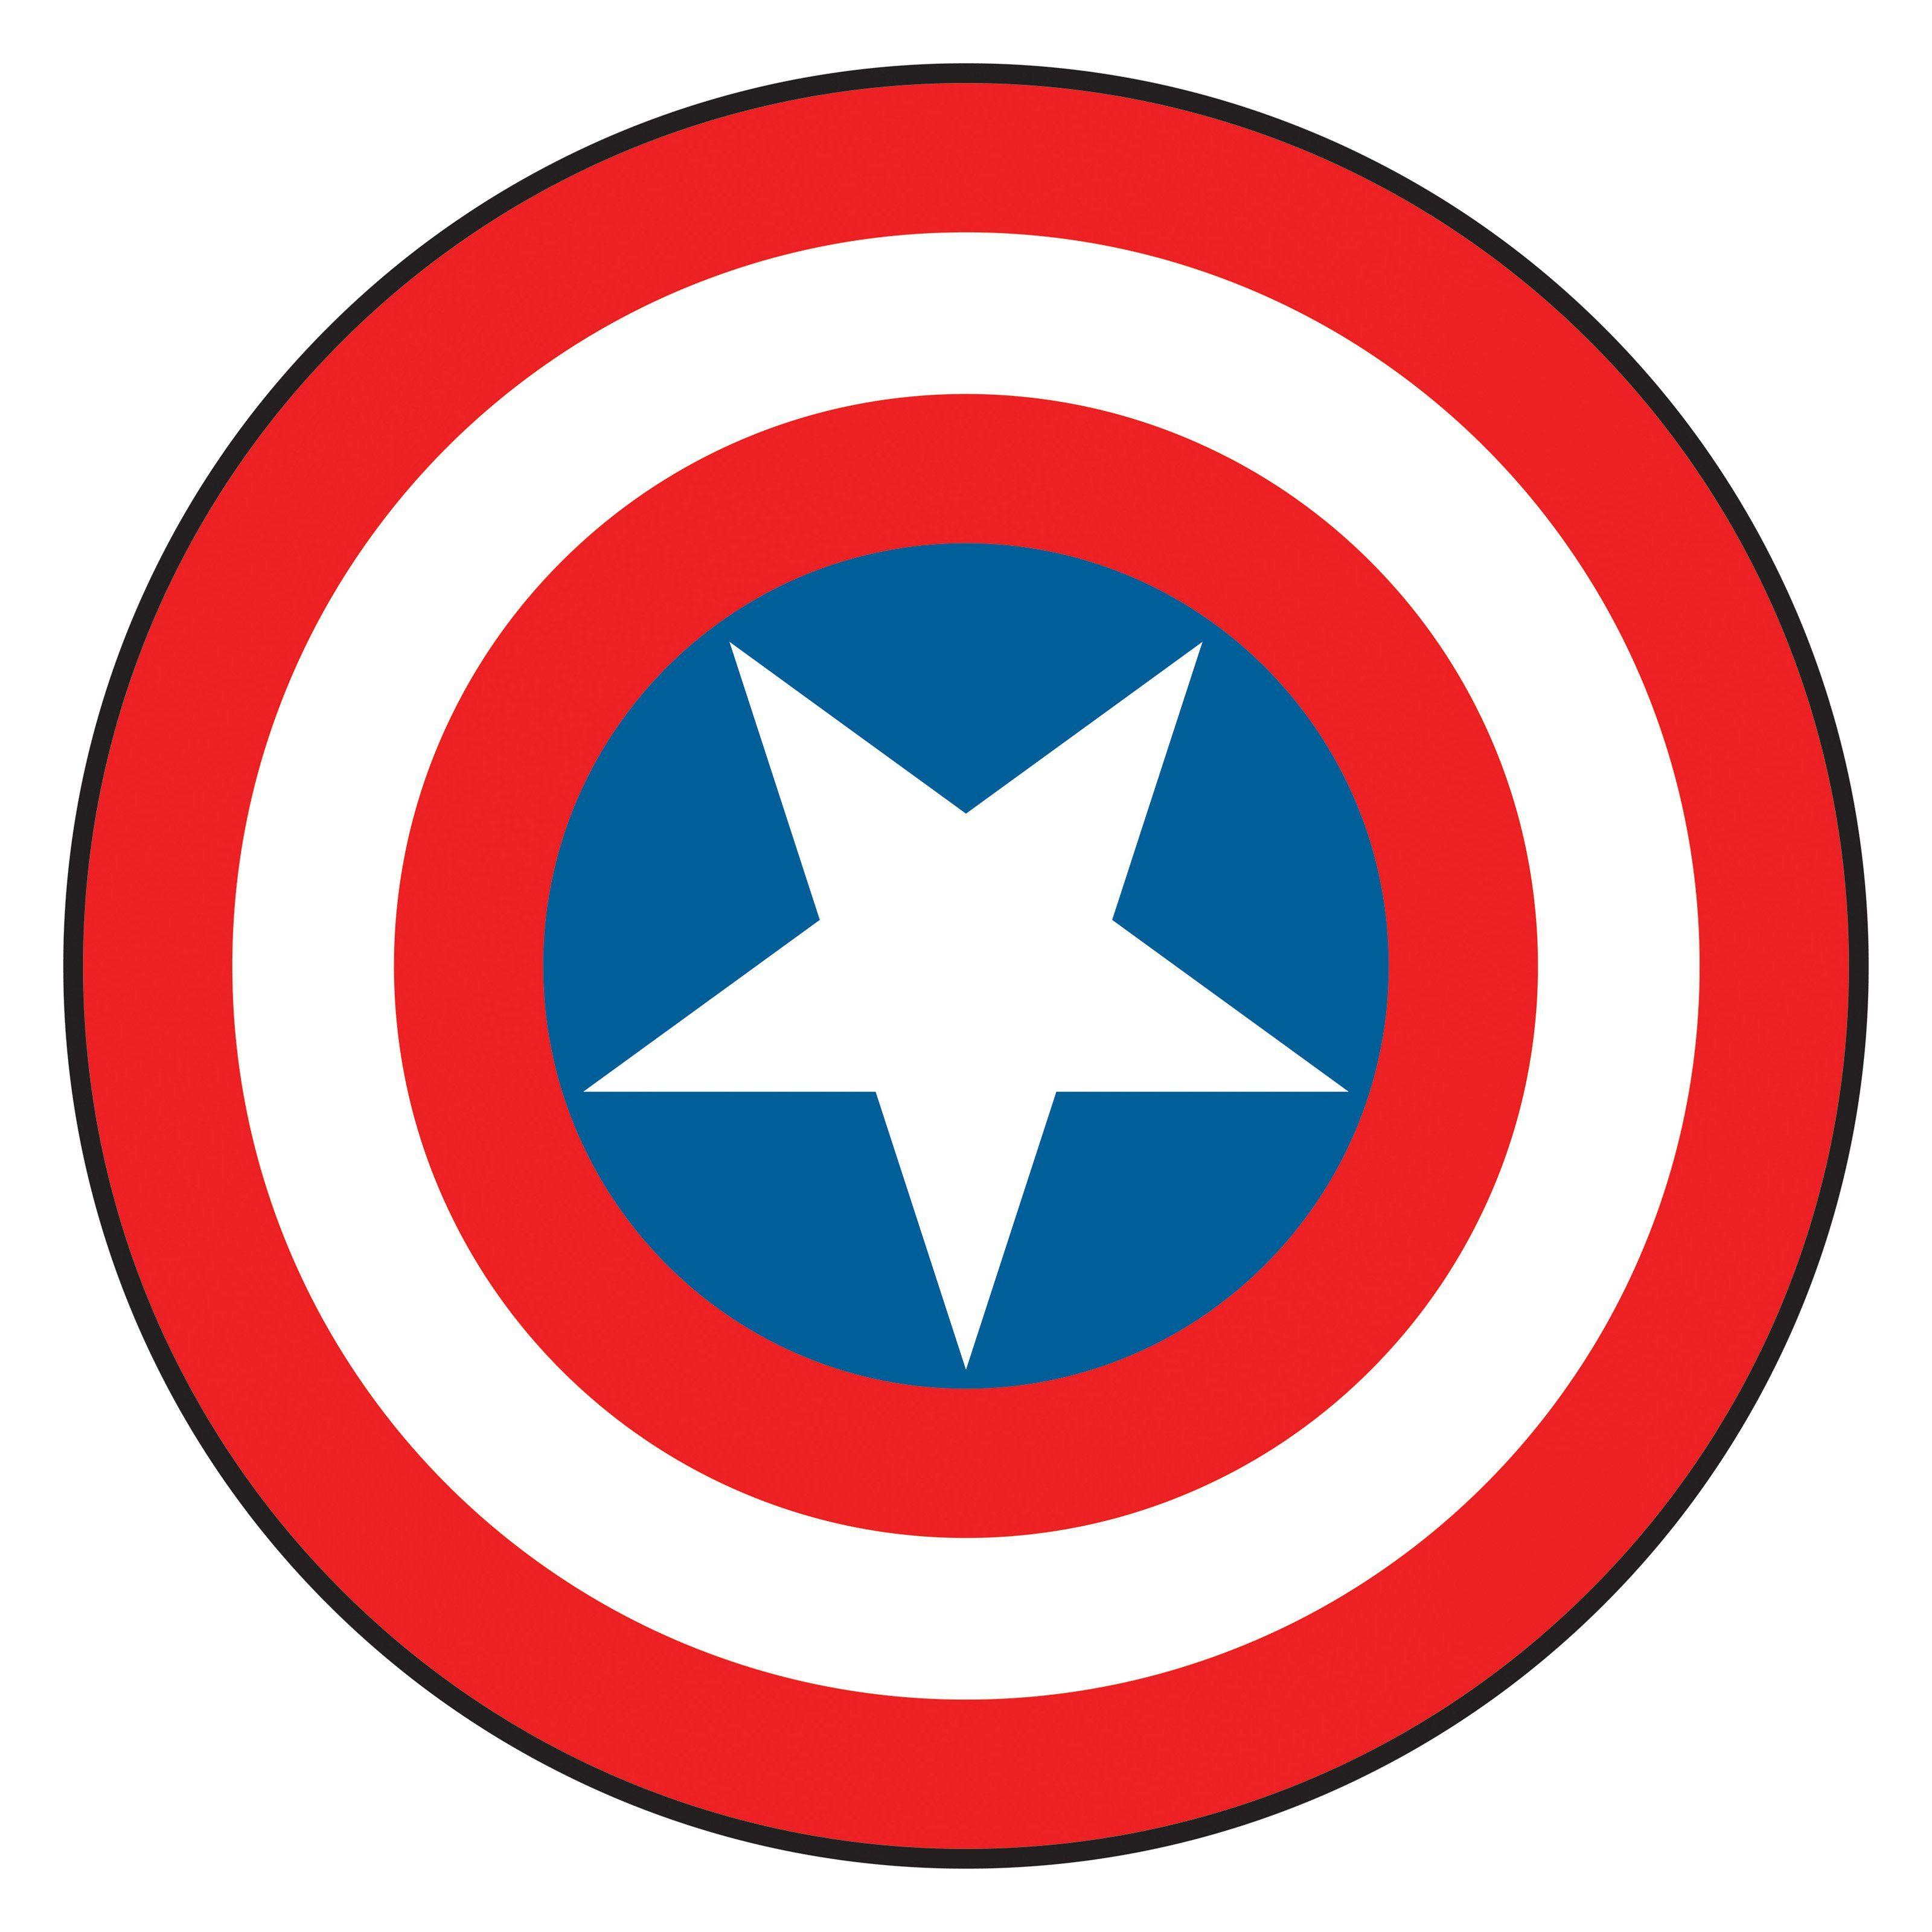 Captian americas sheild clipart jpg black and white Captain America Shield Clipart #1 | ConstCo | Captain america logo ... jpg black and white